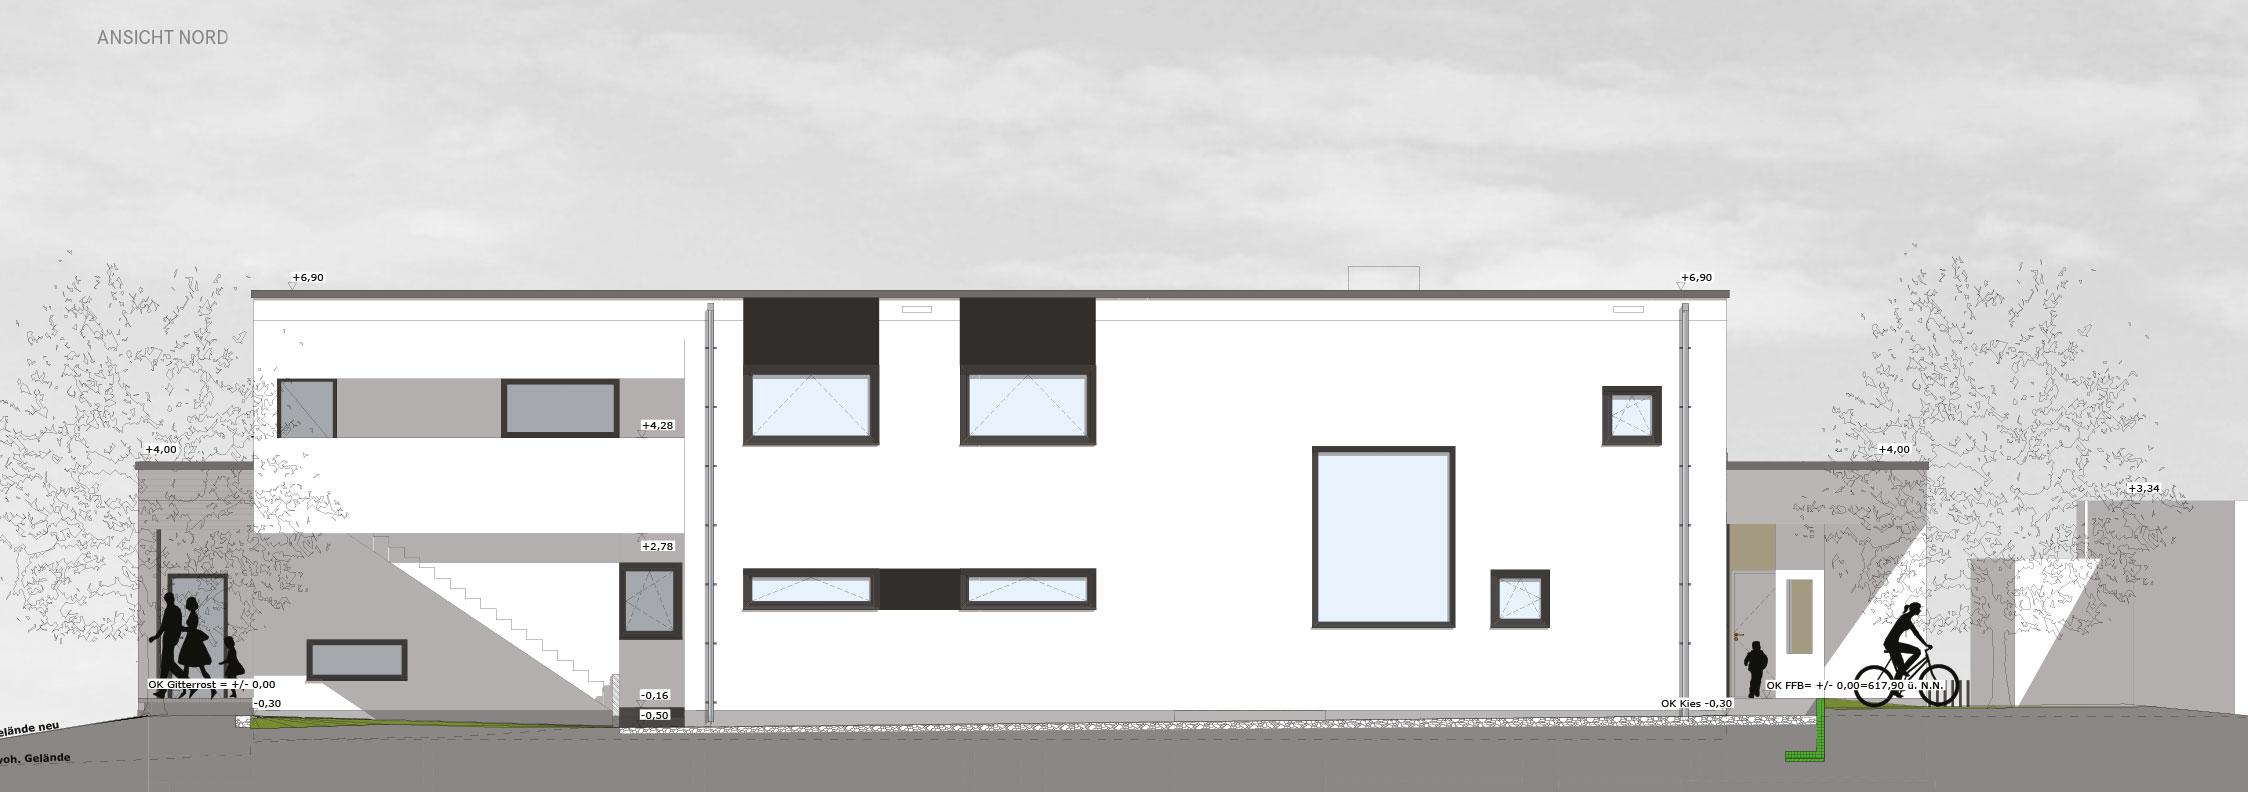 Kinderhaus Papperlapapp, Ansicht Nord